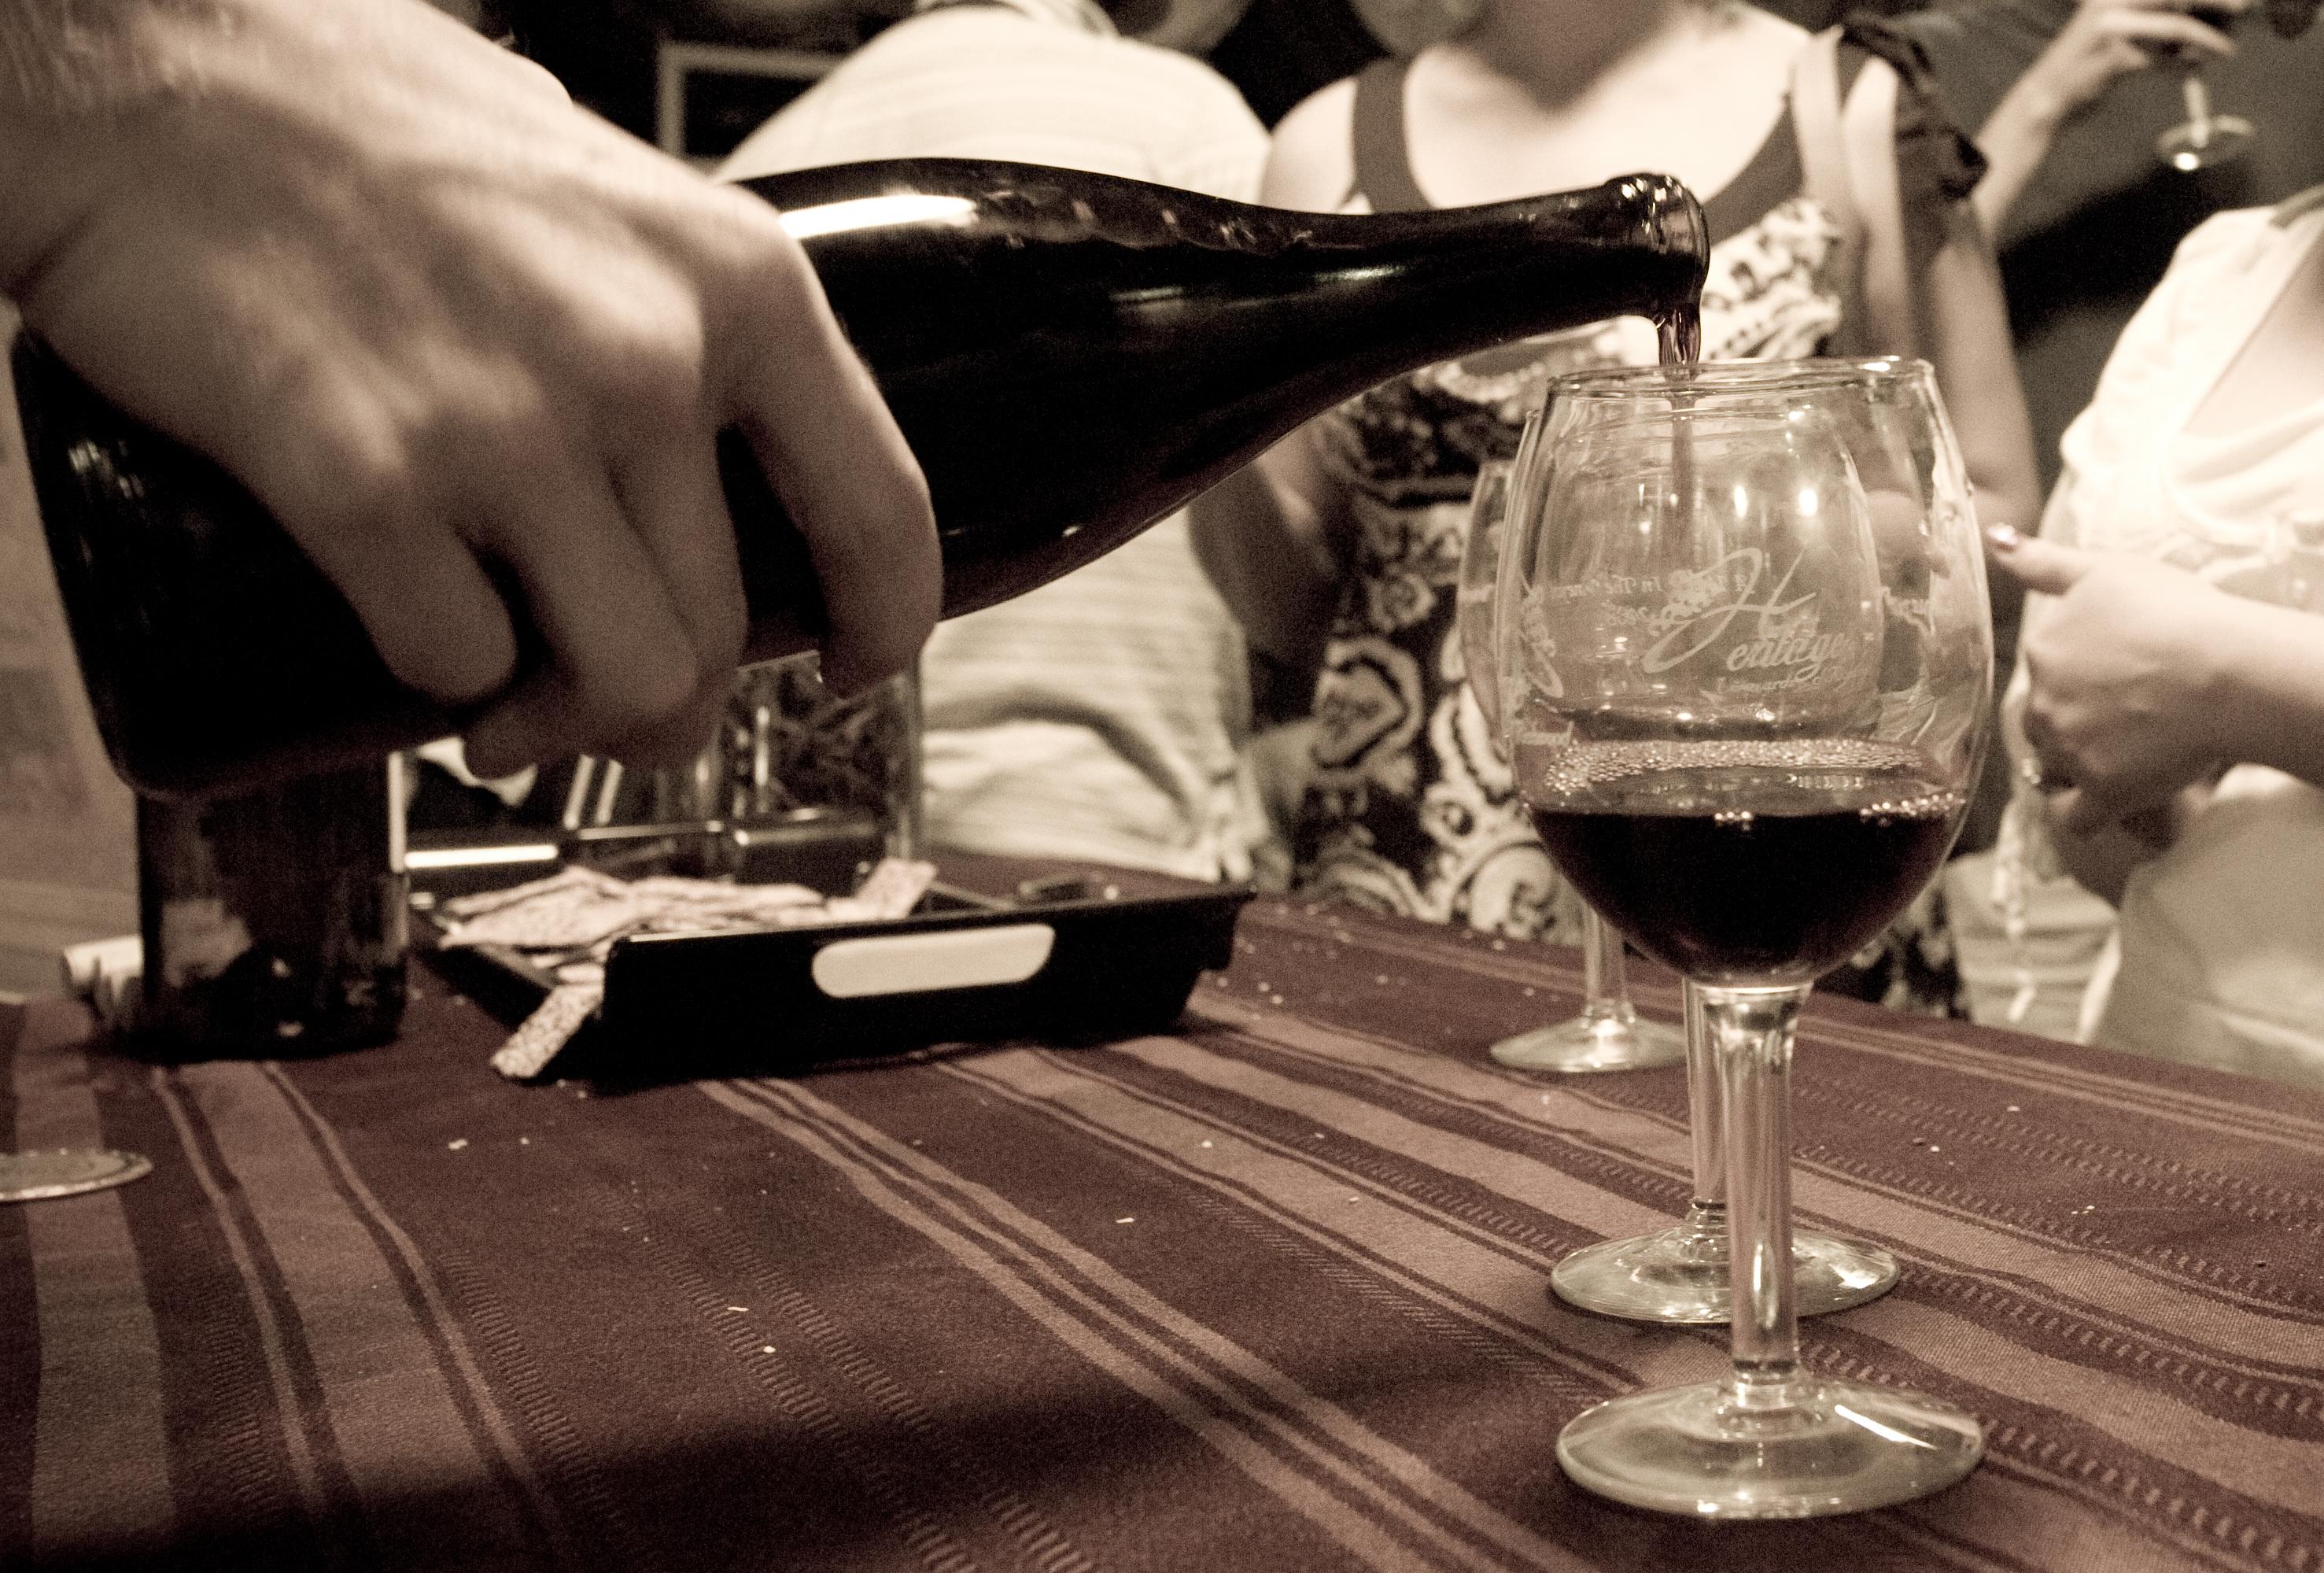 wine_0708-58 - Copy